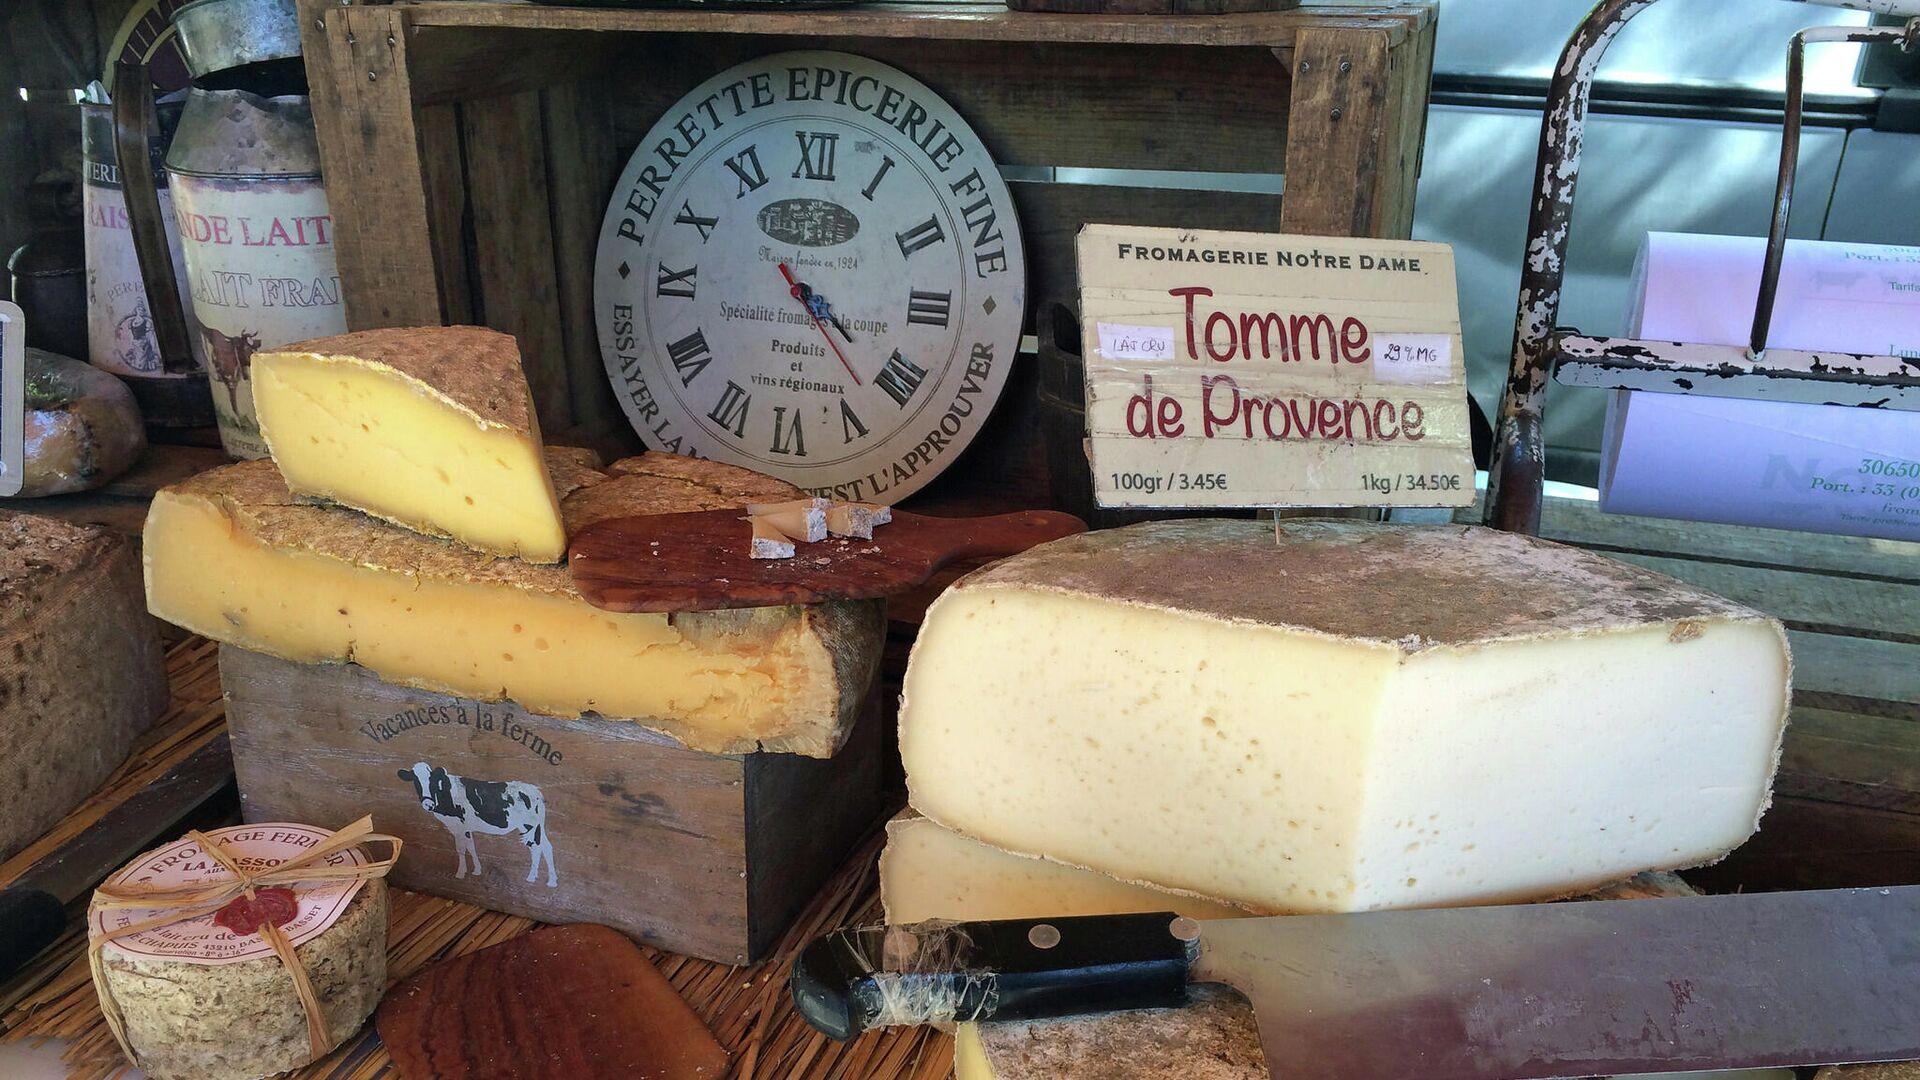 Сыр на прилавке магазина во Франции - РИА Новости, 1920, 14.09.2021